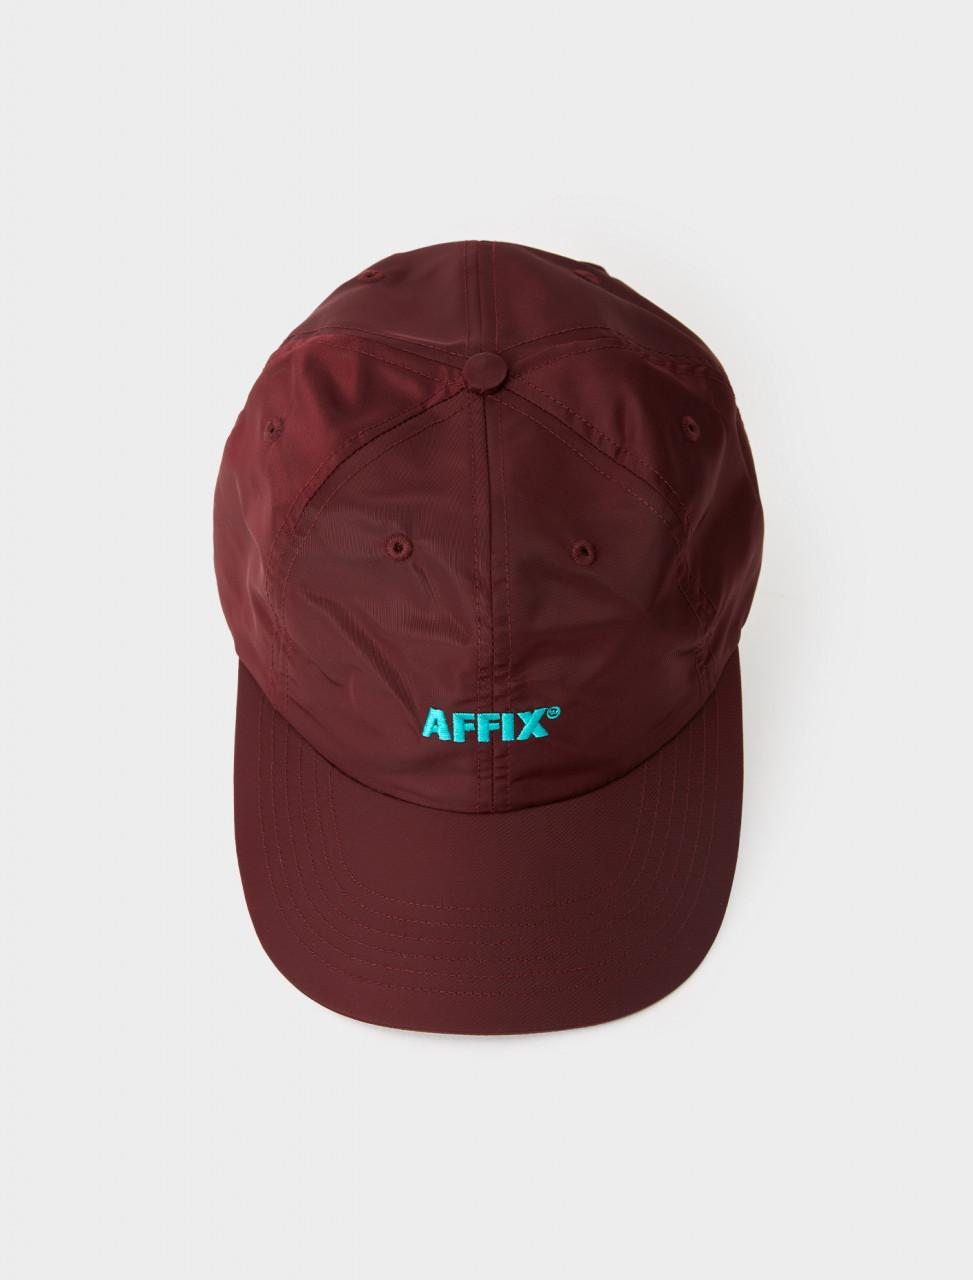 347-AW20ACC04-DR AFFIX NYLON STANDARD LOGO CAP DEEP RED